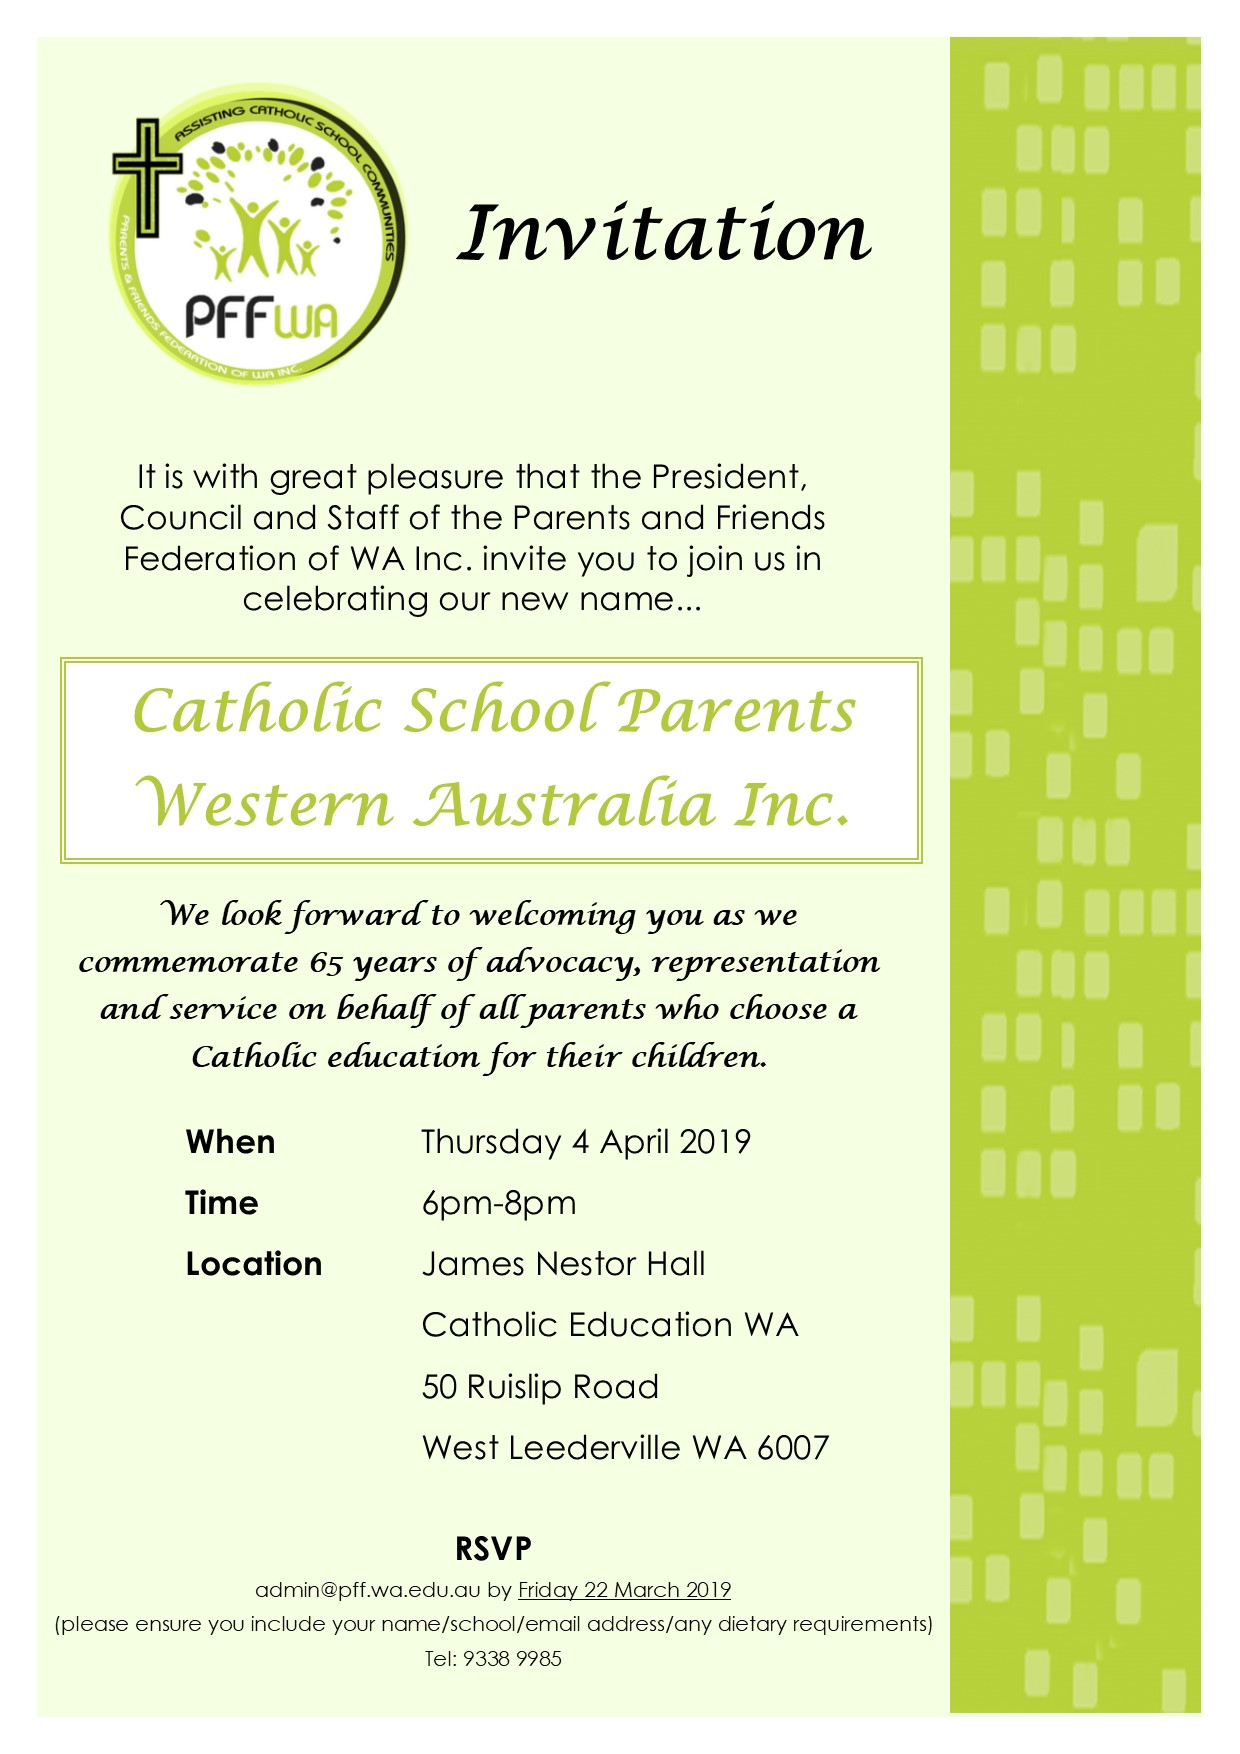 CSPWA Invitation - Parent Group Executive.jpg